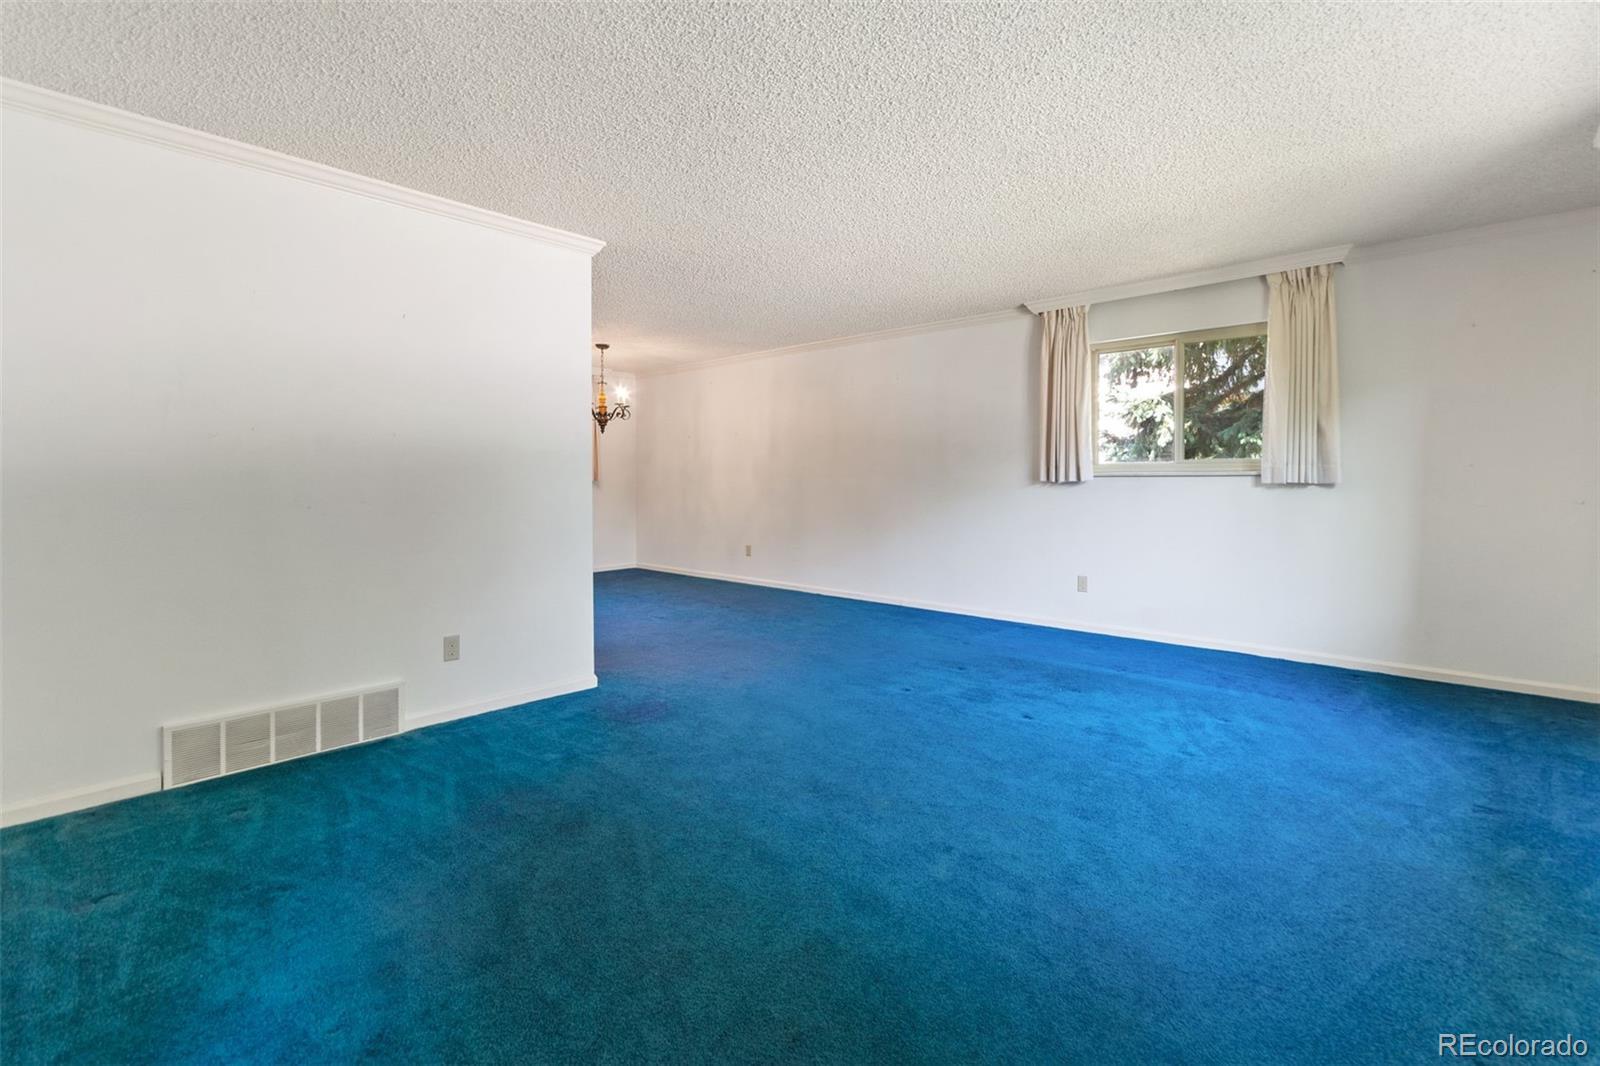 MLS# 7770404 - 4 - 2355 S Hoyt Street, Lakewood, CO 80227